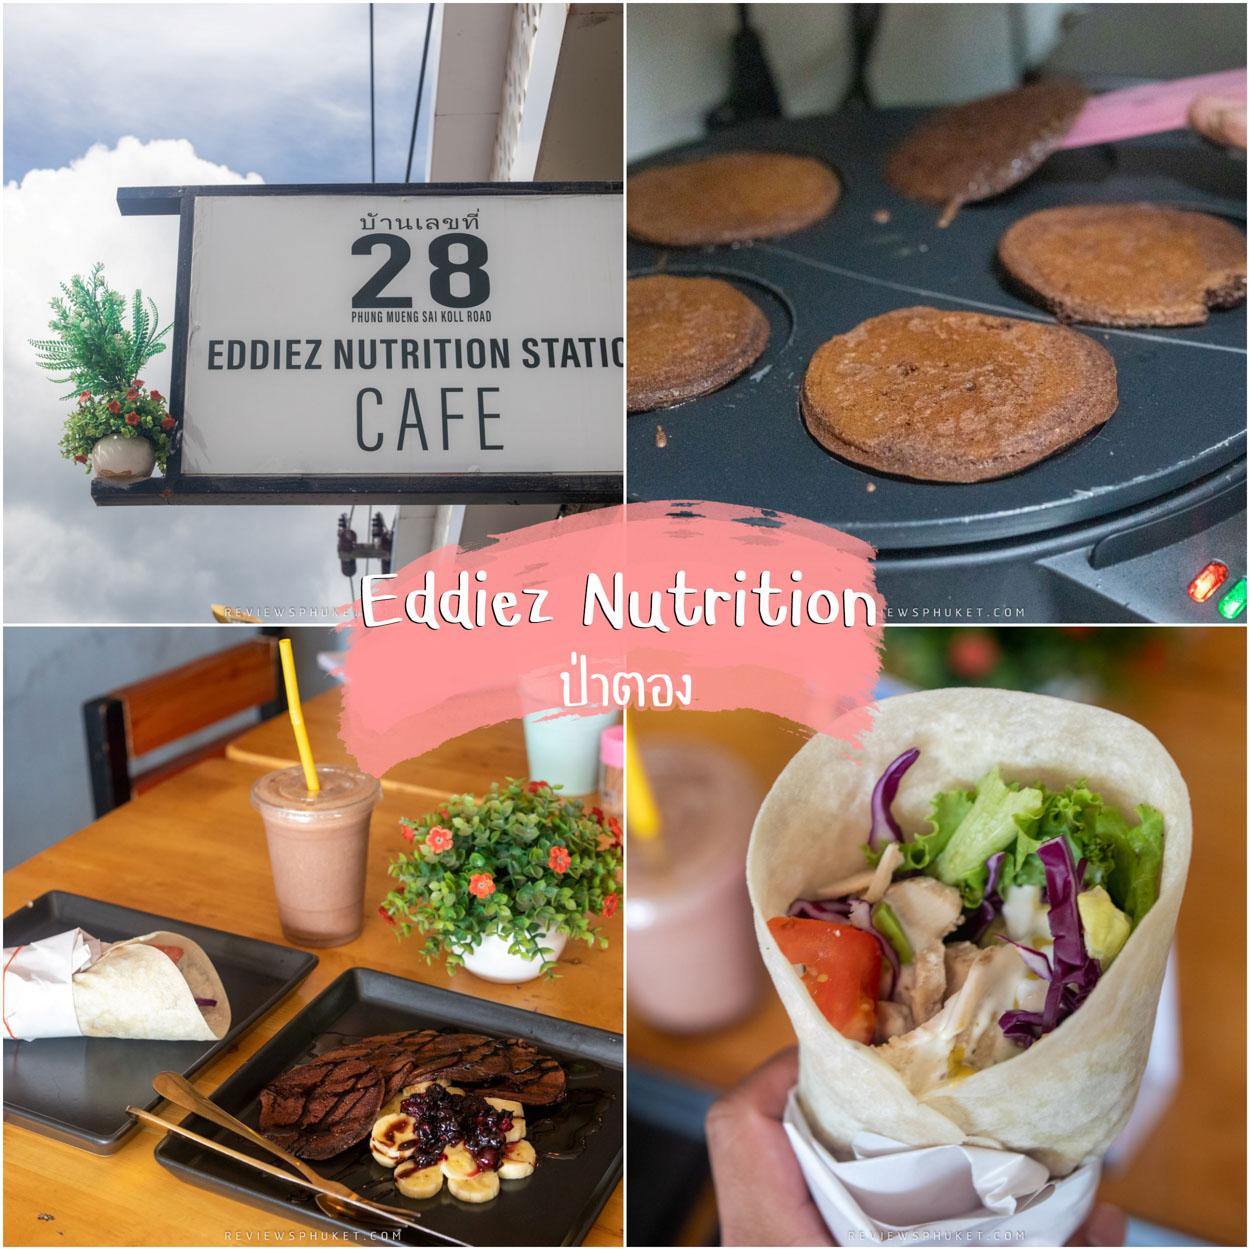 Eddiez Nutrition Cafe ที่สุดแห่งร้านอินดี้ป่าตอง บอกเลยร้านนี้เด็ดจุดเด่นคือทุกเมนูสุขภาพทั้งหมด